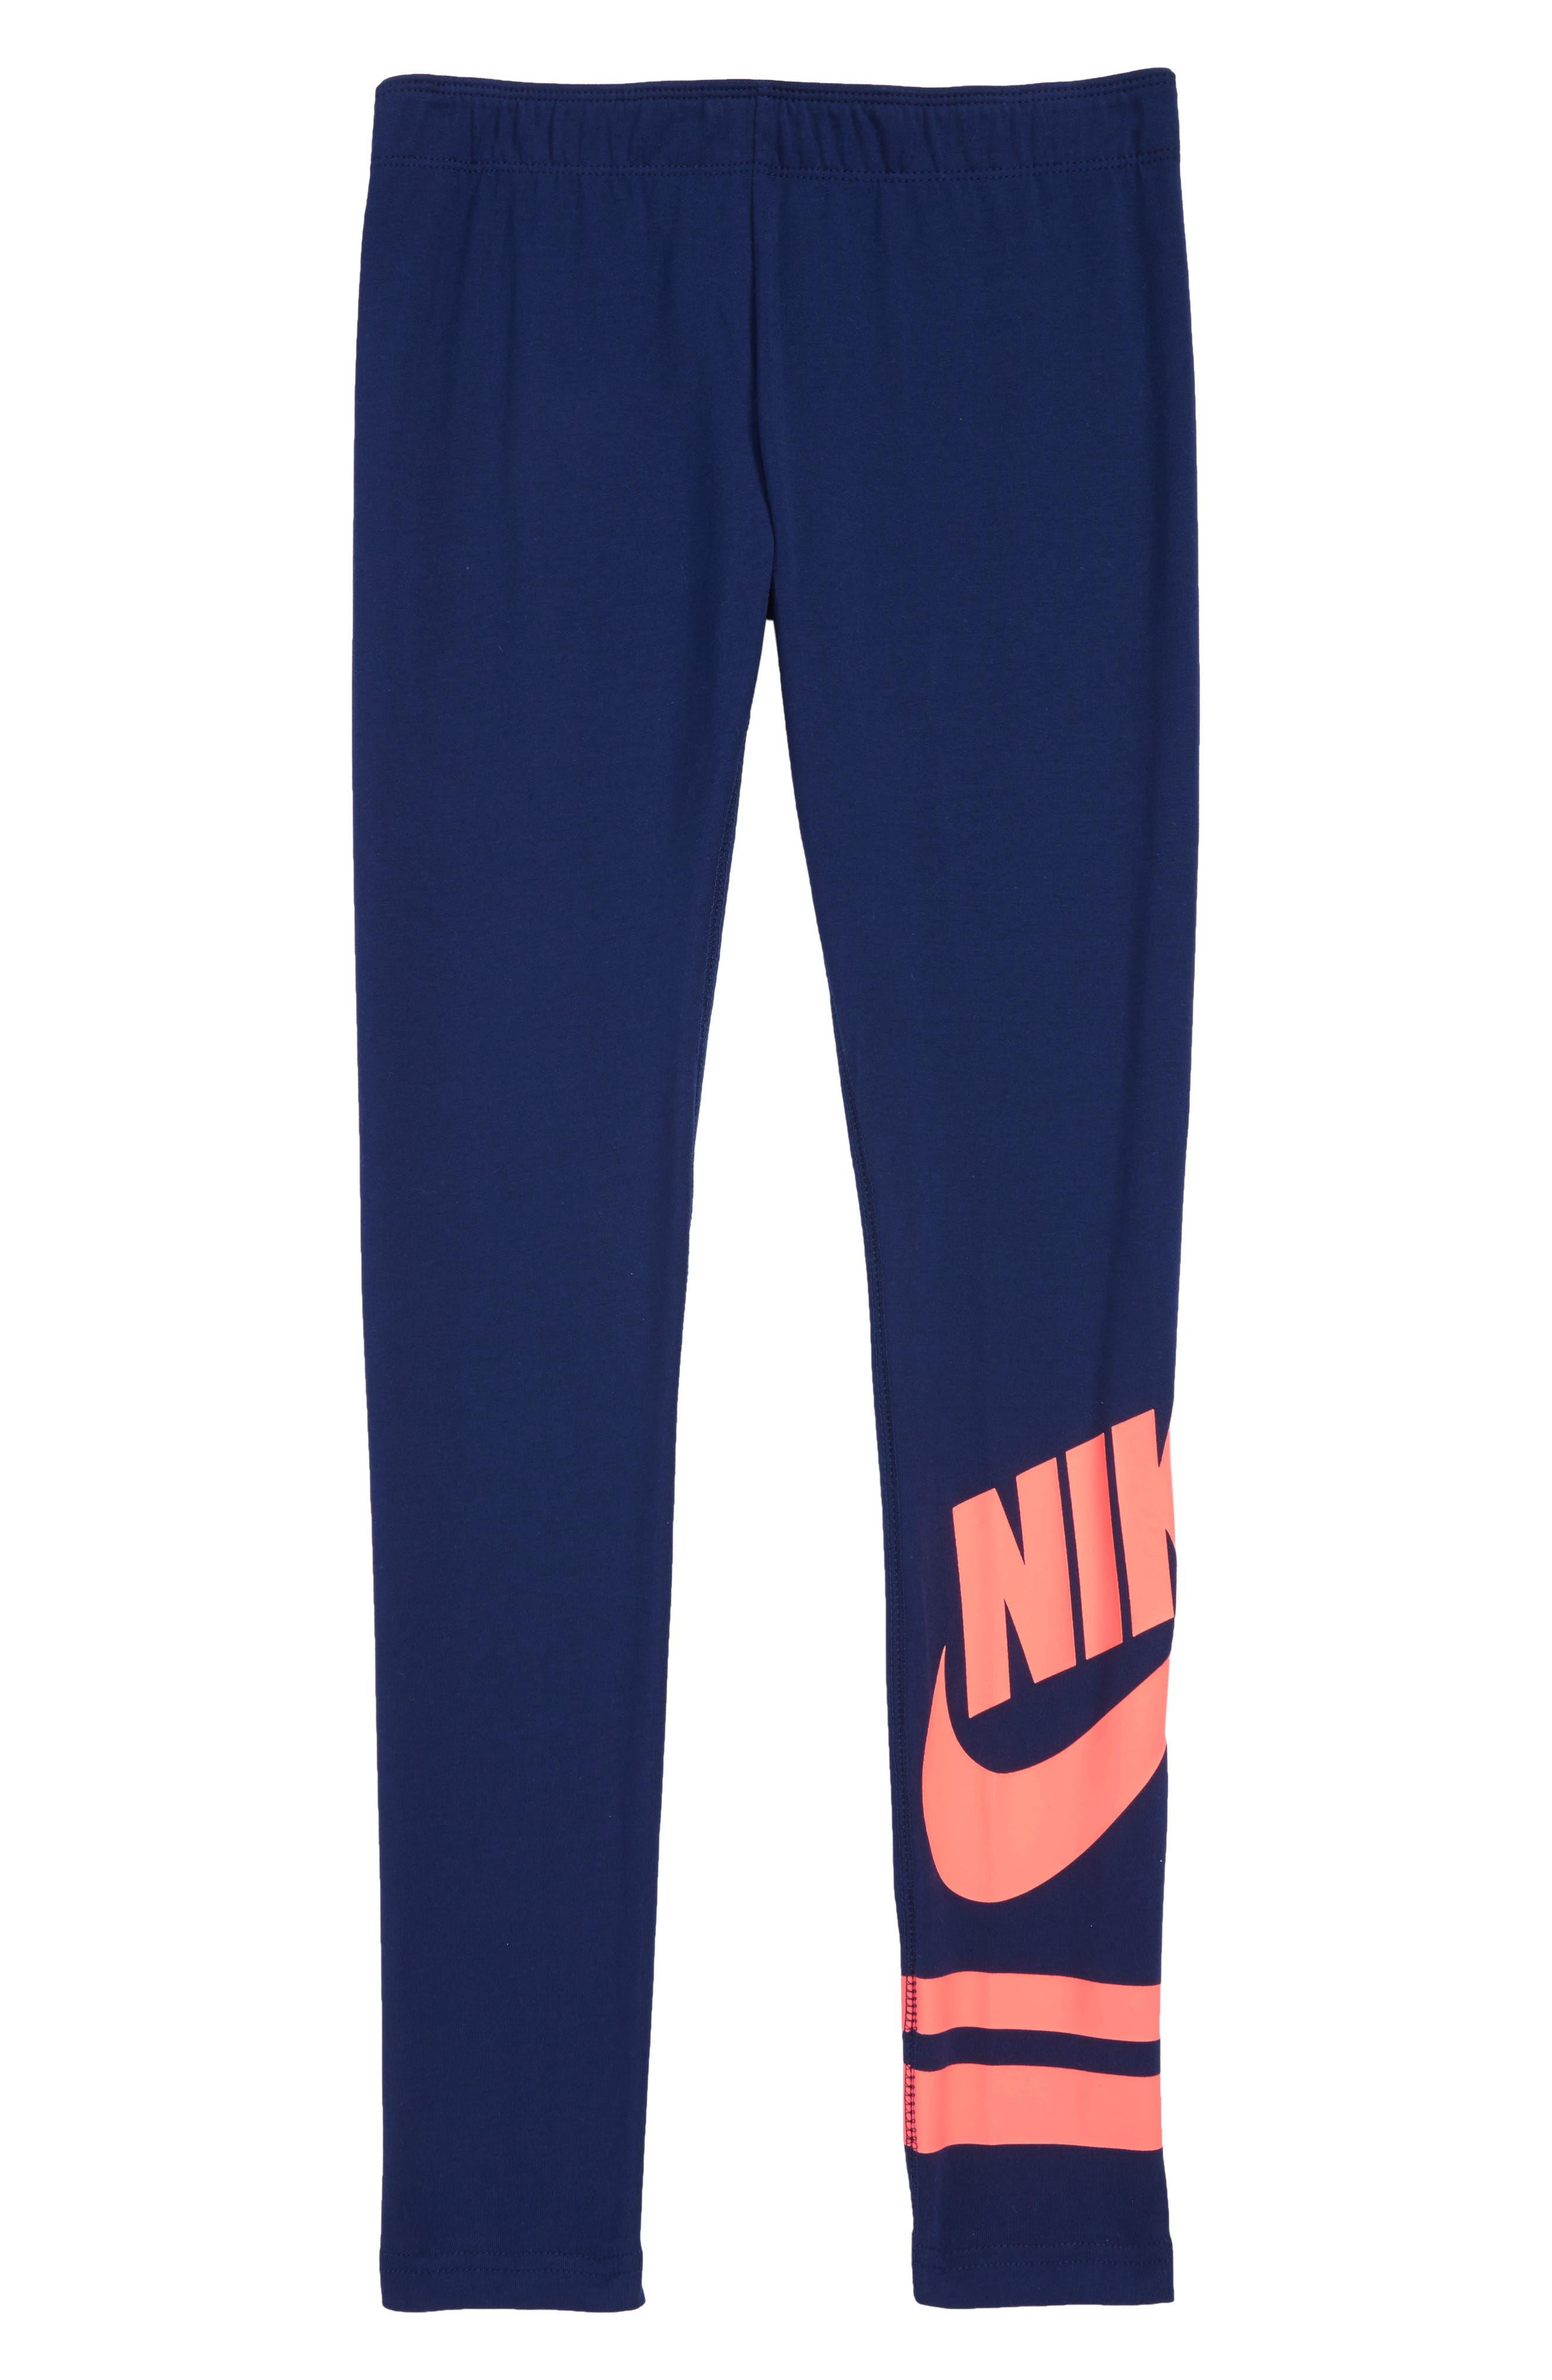 Sportswear Leggings,                             Main thumbnail 1, color,                             BLUE VOID/ LAVA GLOW